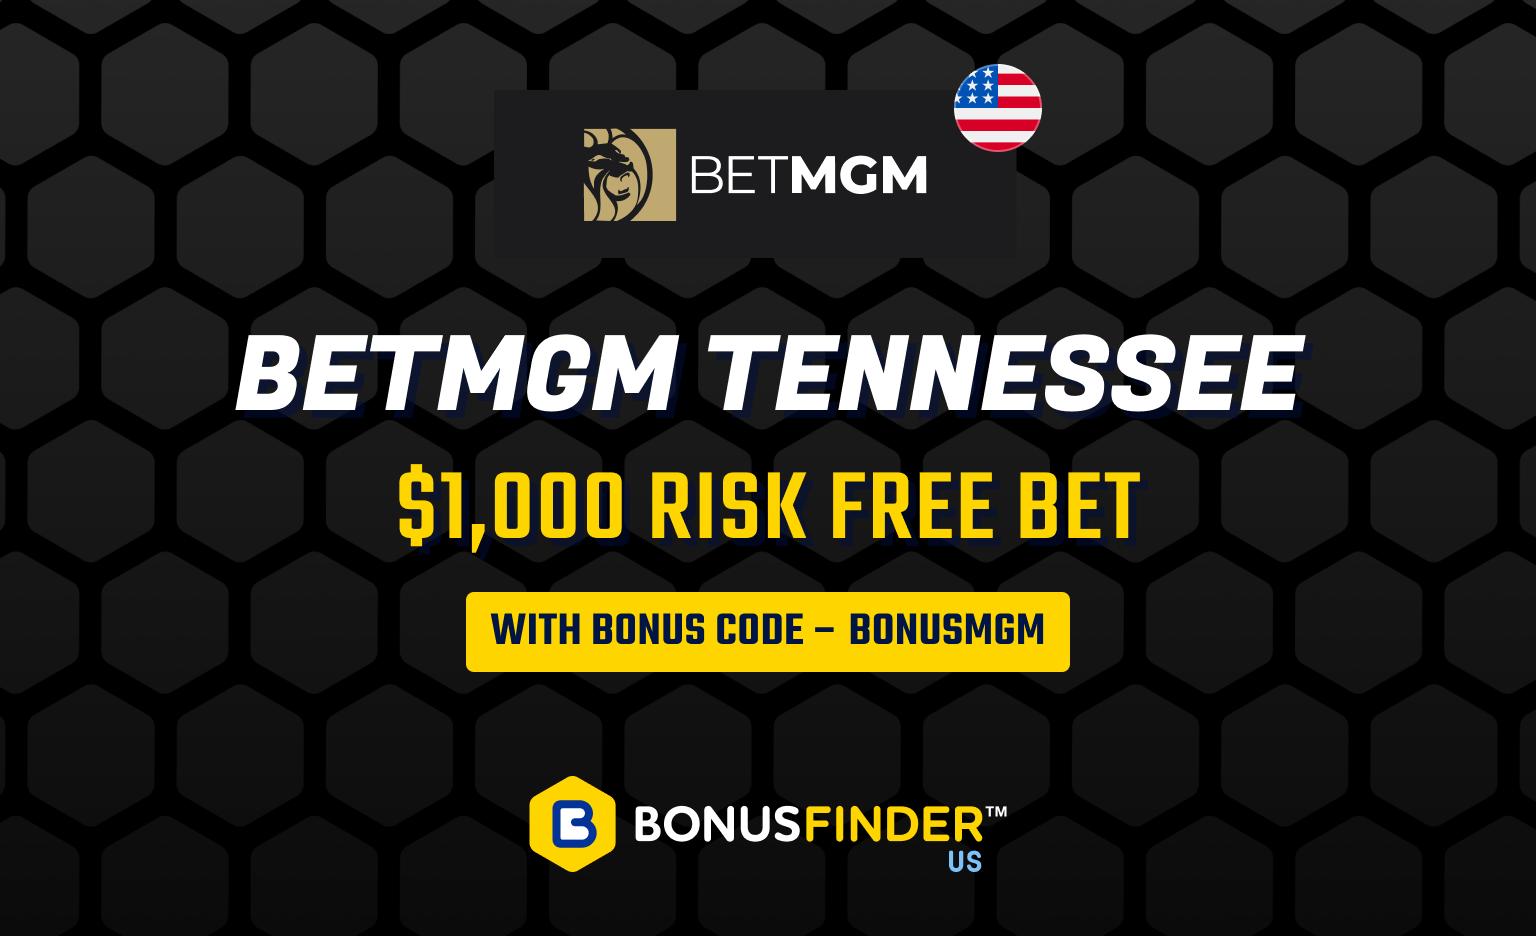 BetMGM Tennessee